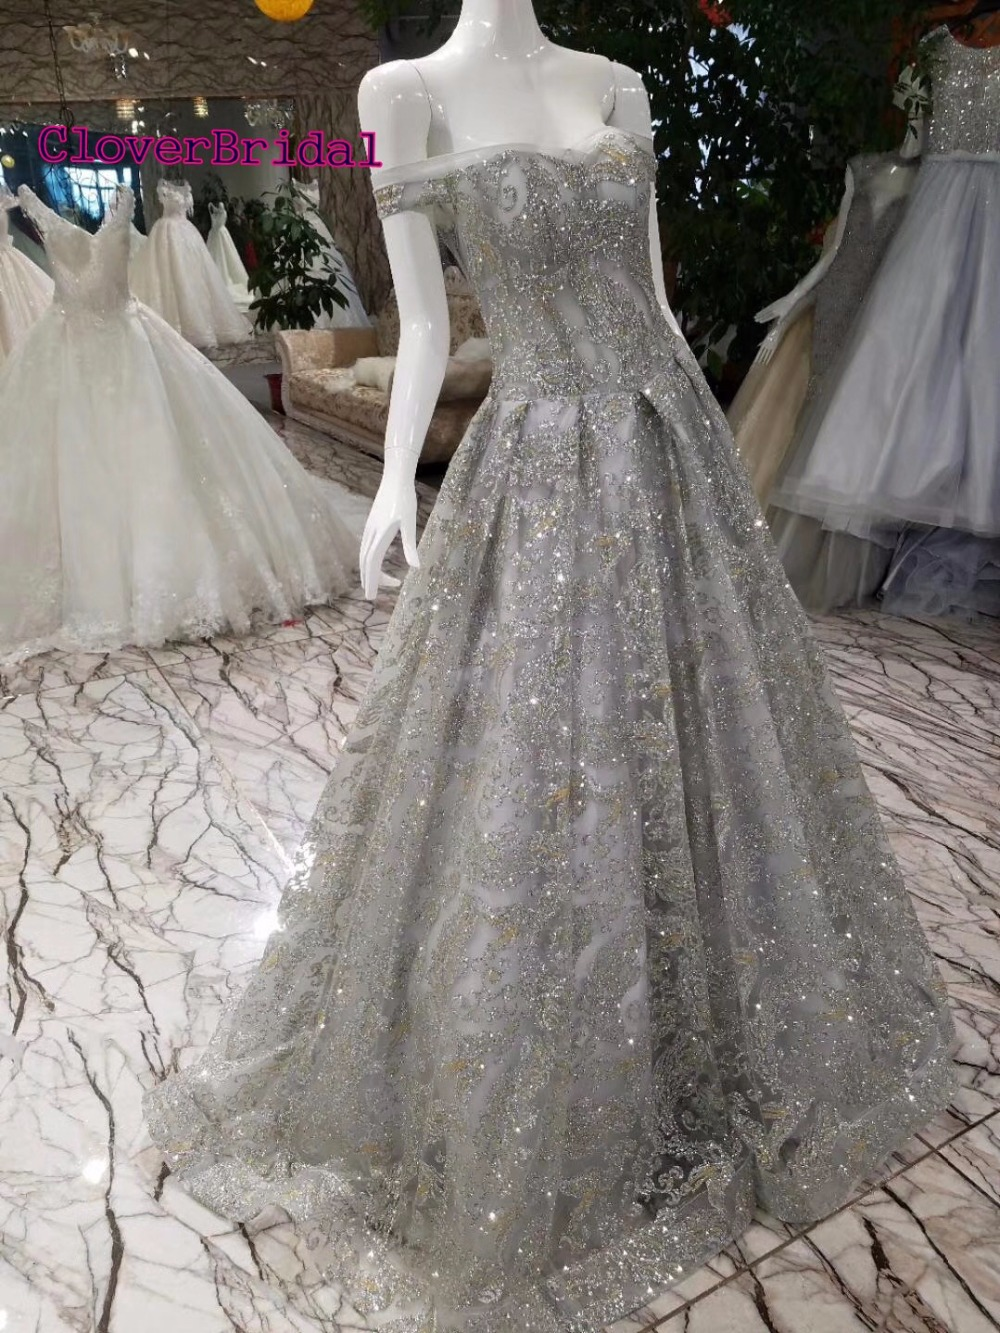 CloverBridal high quality off-the-shoulder floor length shinning glitter prom dresses 2018 A-line corset back gold